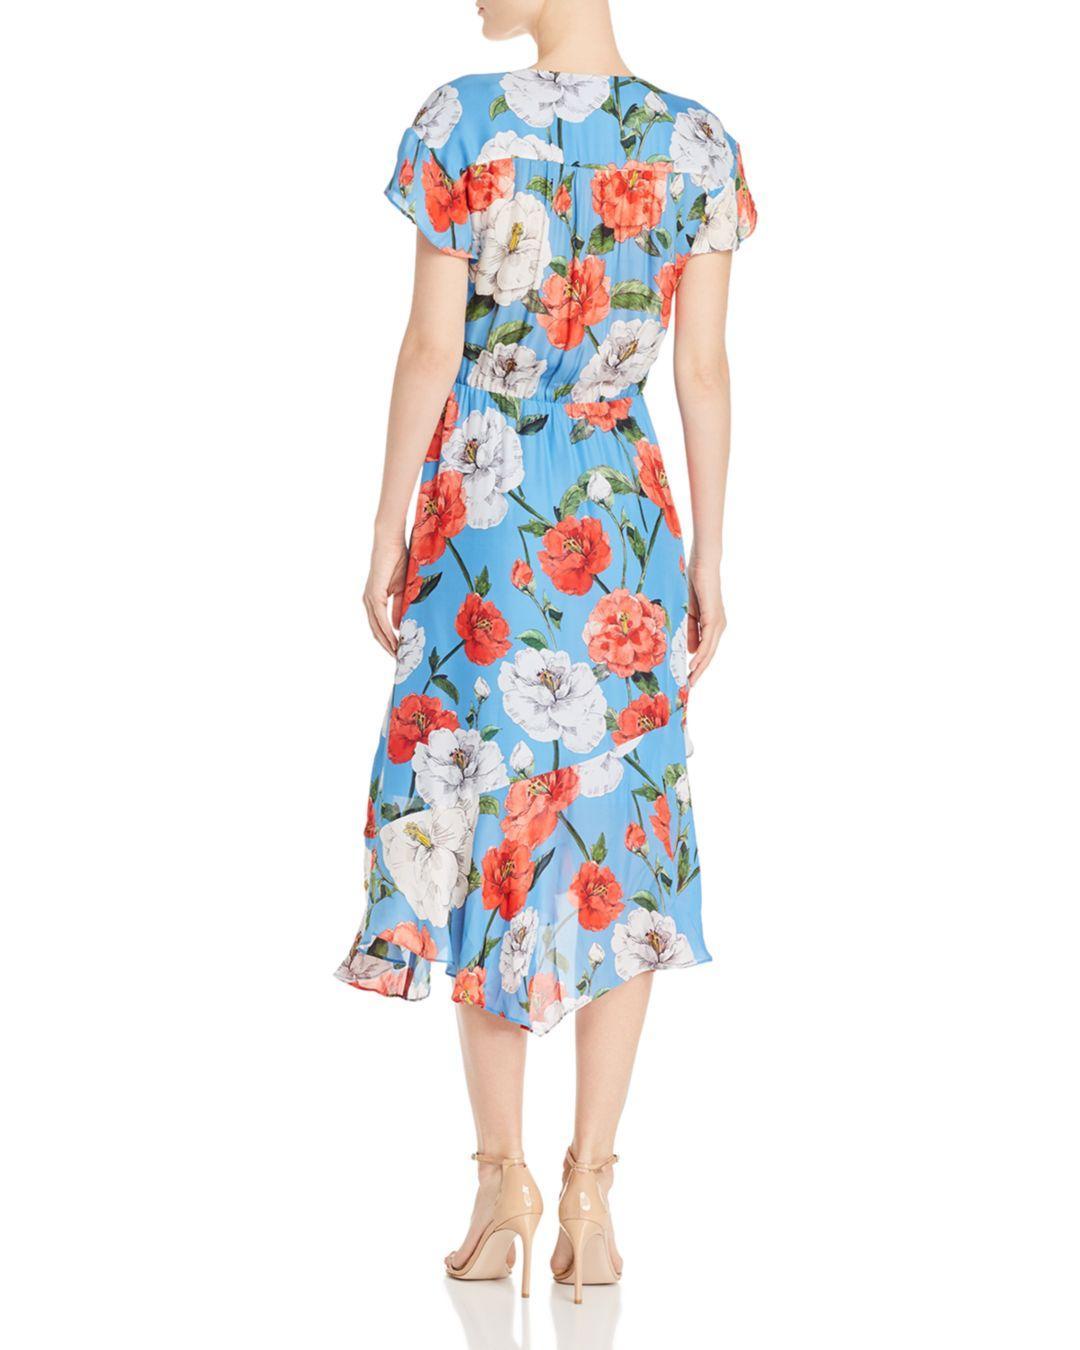 0a2ec844 Parker Reina Floral Print Midi Dress in Blue - Lyst